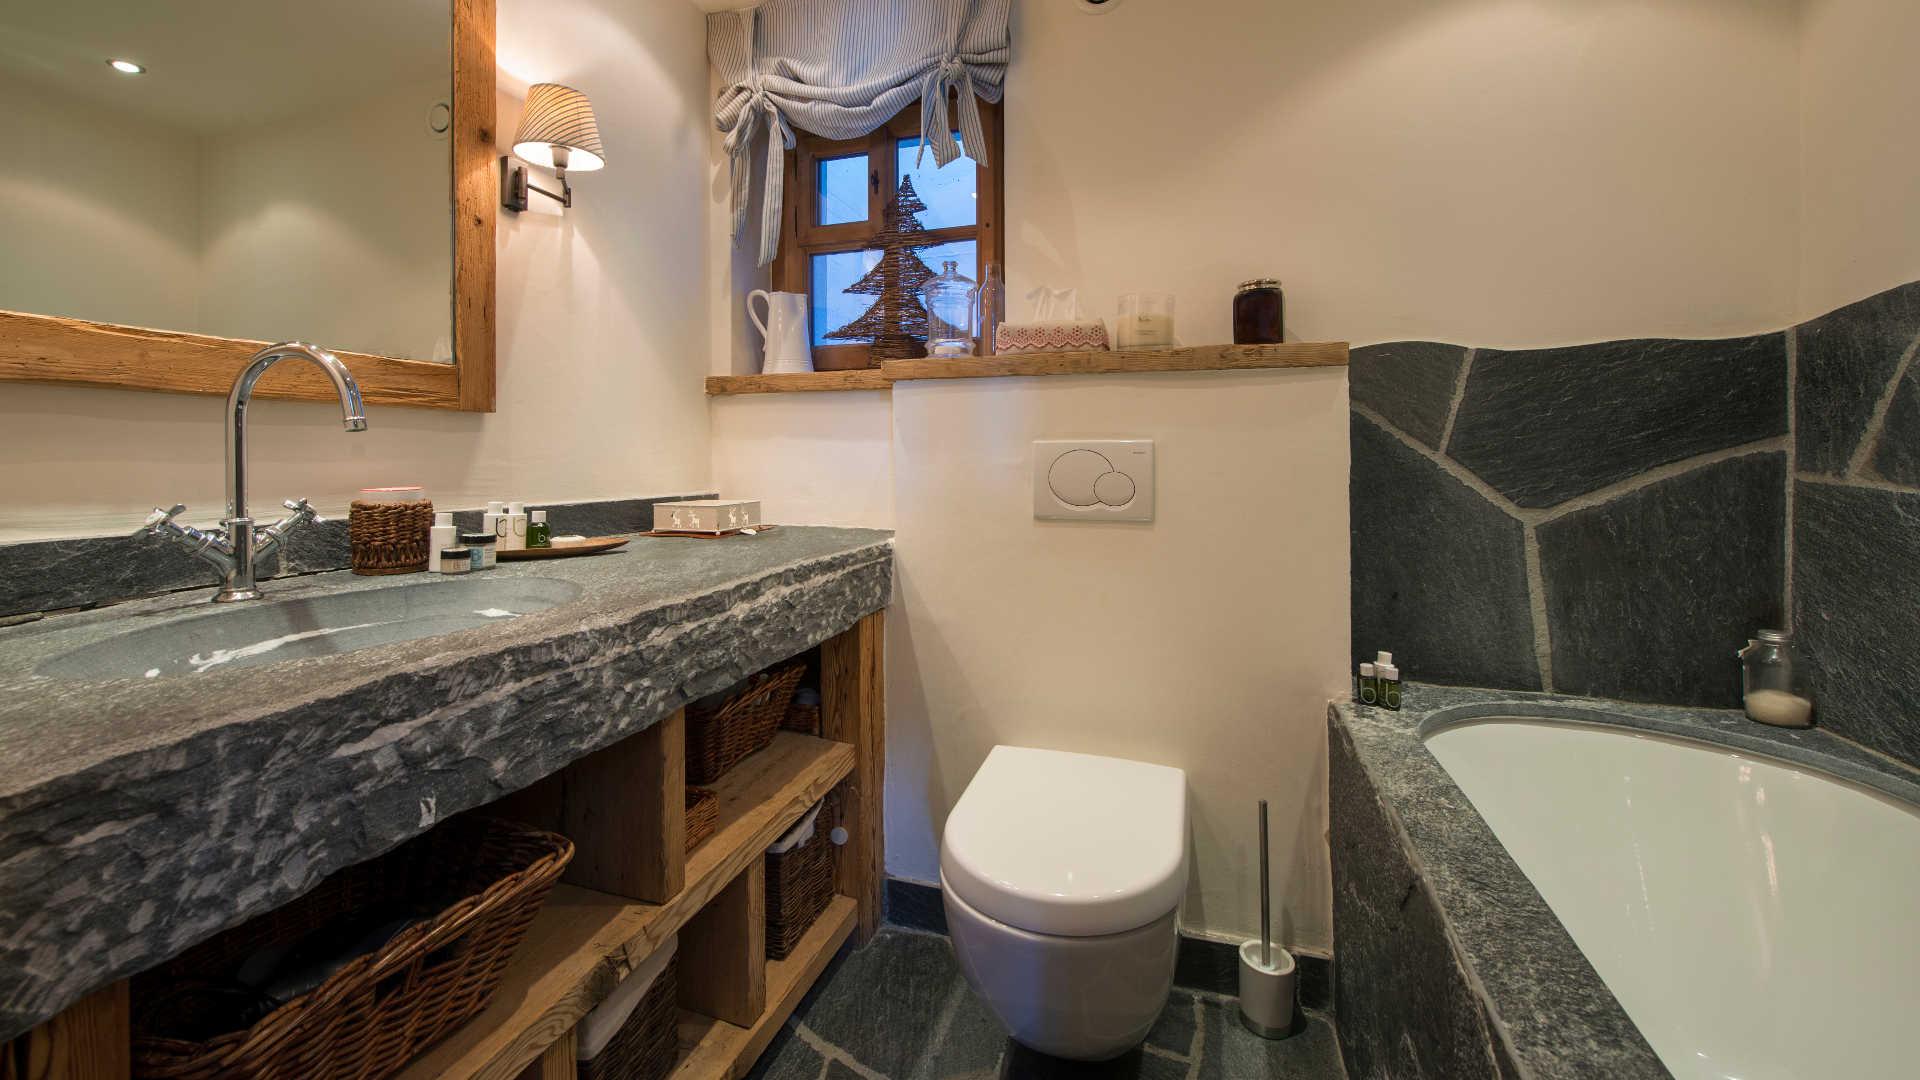 chalet-nyumba-bathroom3-2